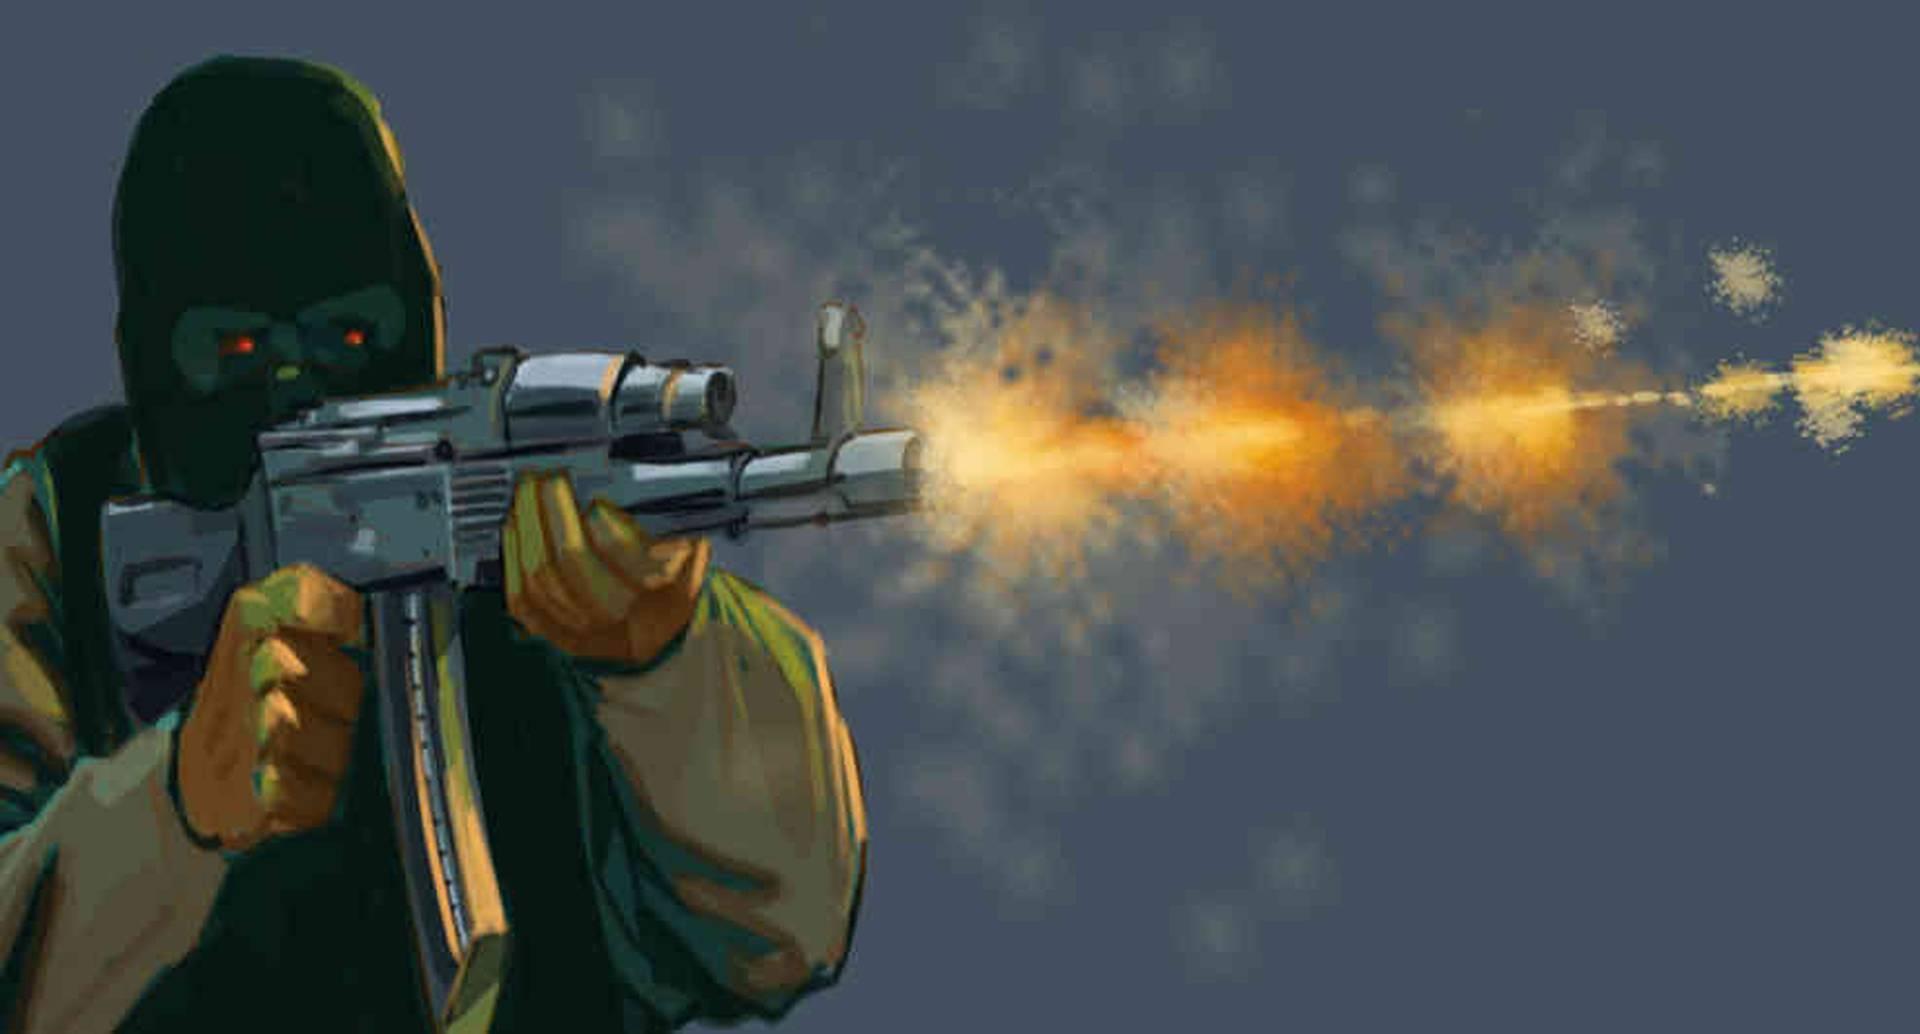 Asesinan a líder indígena en Tumaco/Ilustración de SEMANA